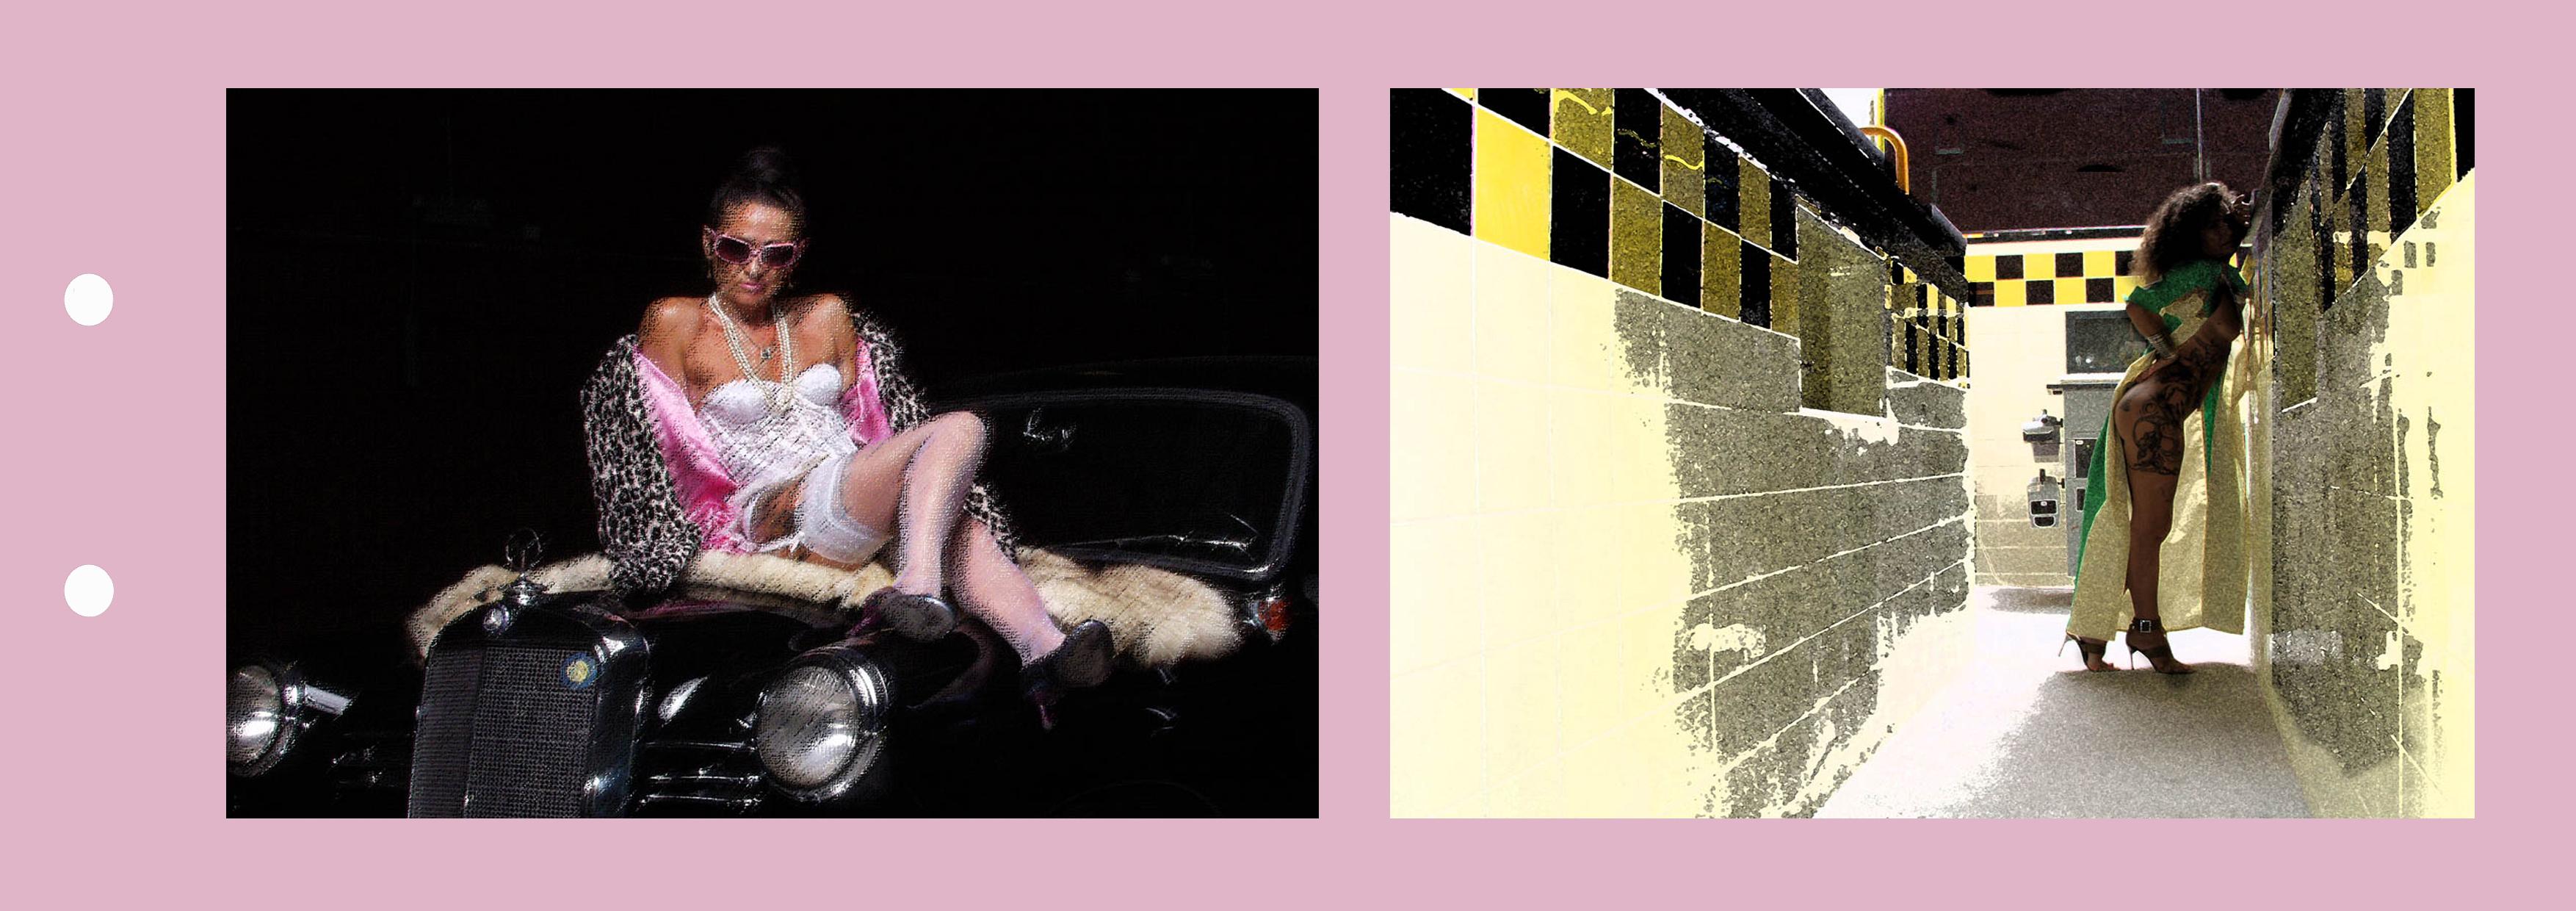 15-catalogo-ANTONIO+MULA-3.jpg